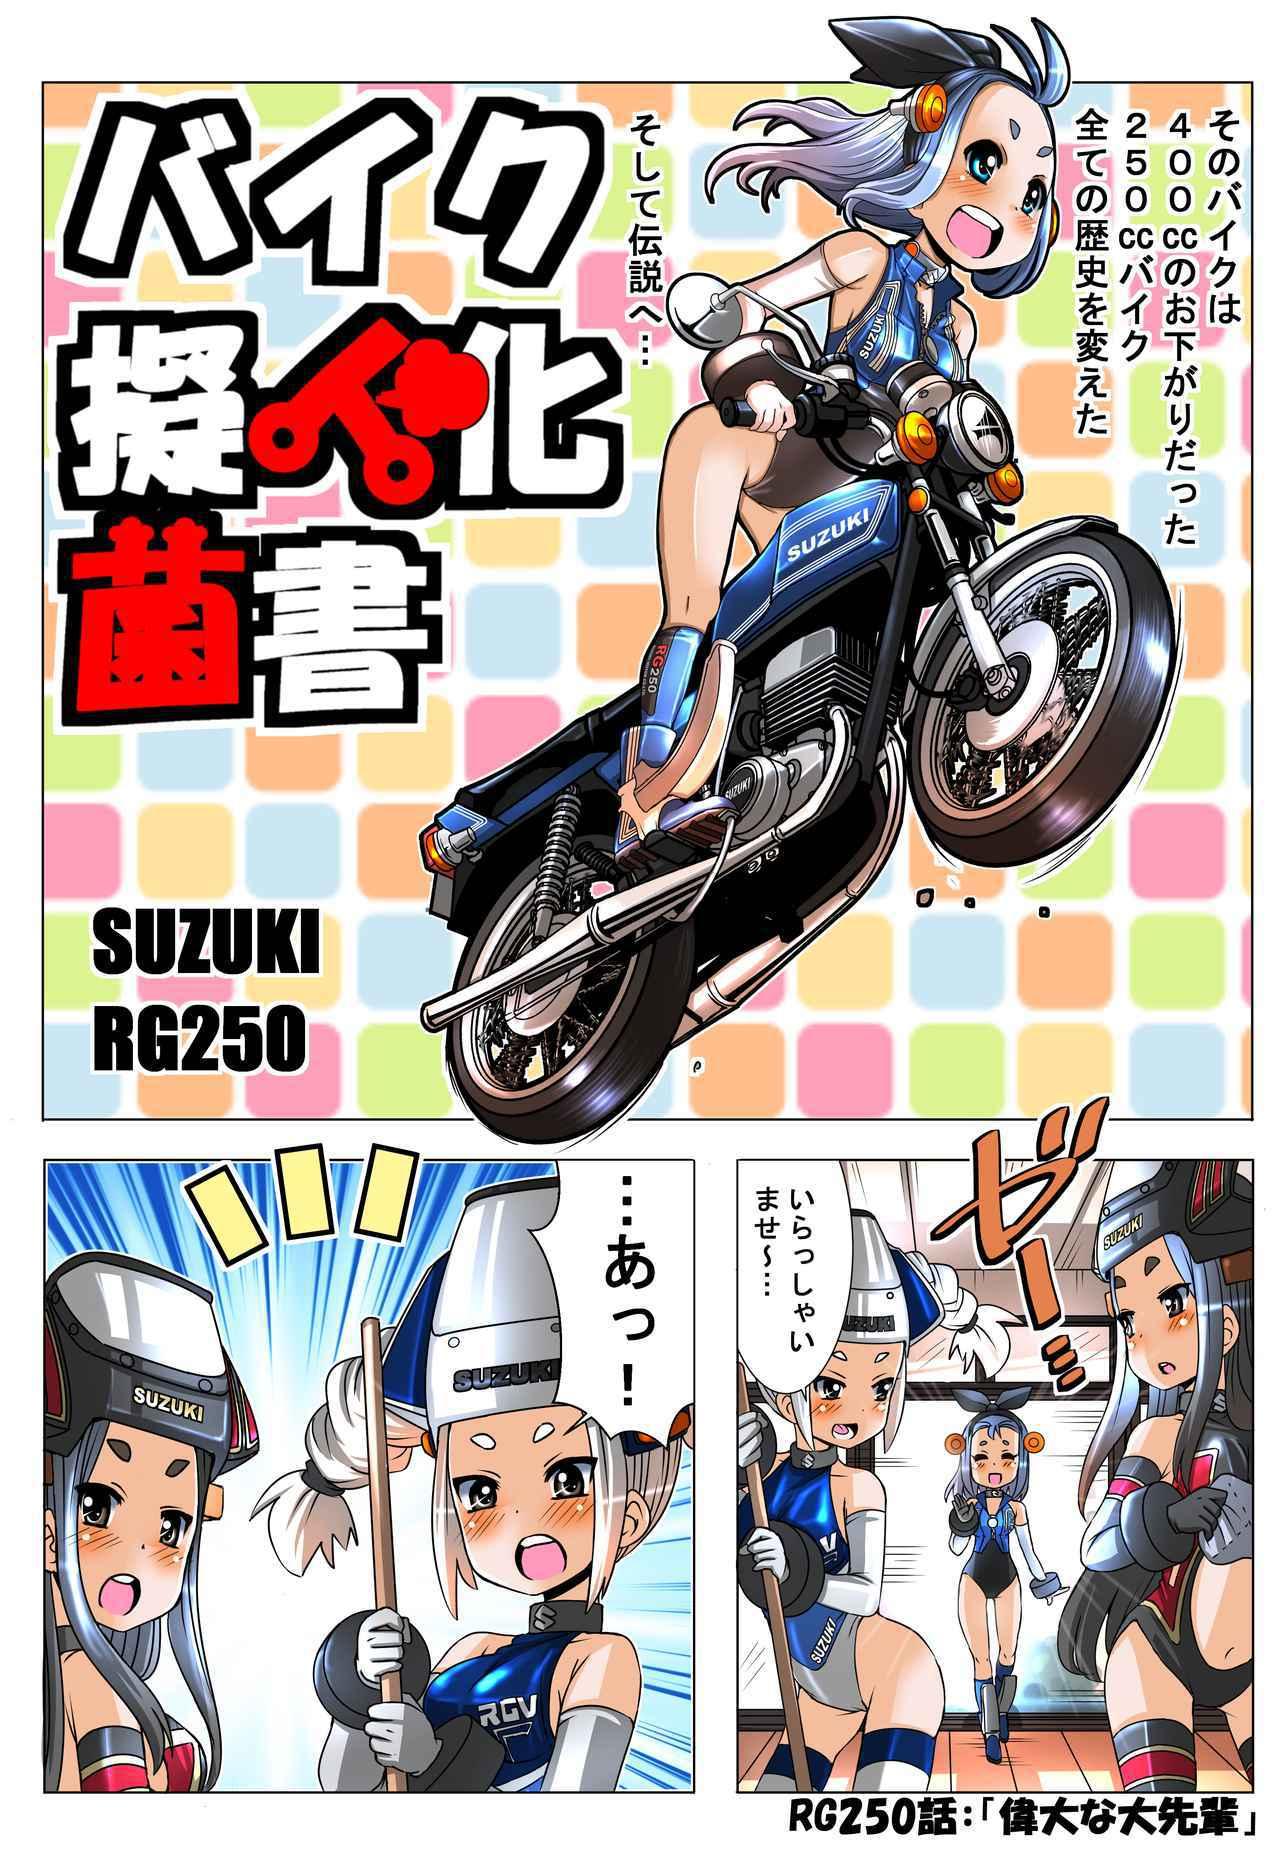 画像1: 『バイク擬人化菌書』RG250 話「偉大な大先輩」 作:鈴木秀吉